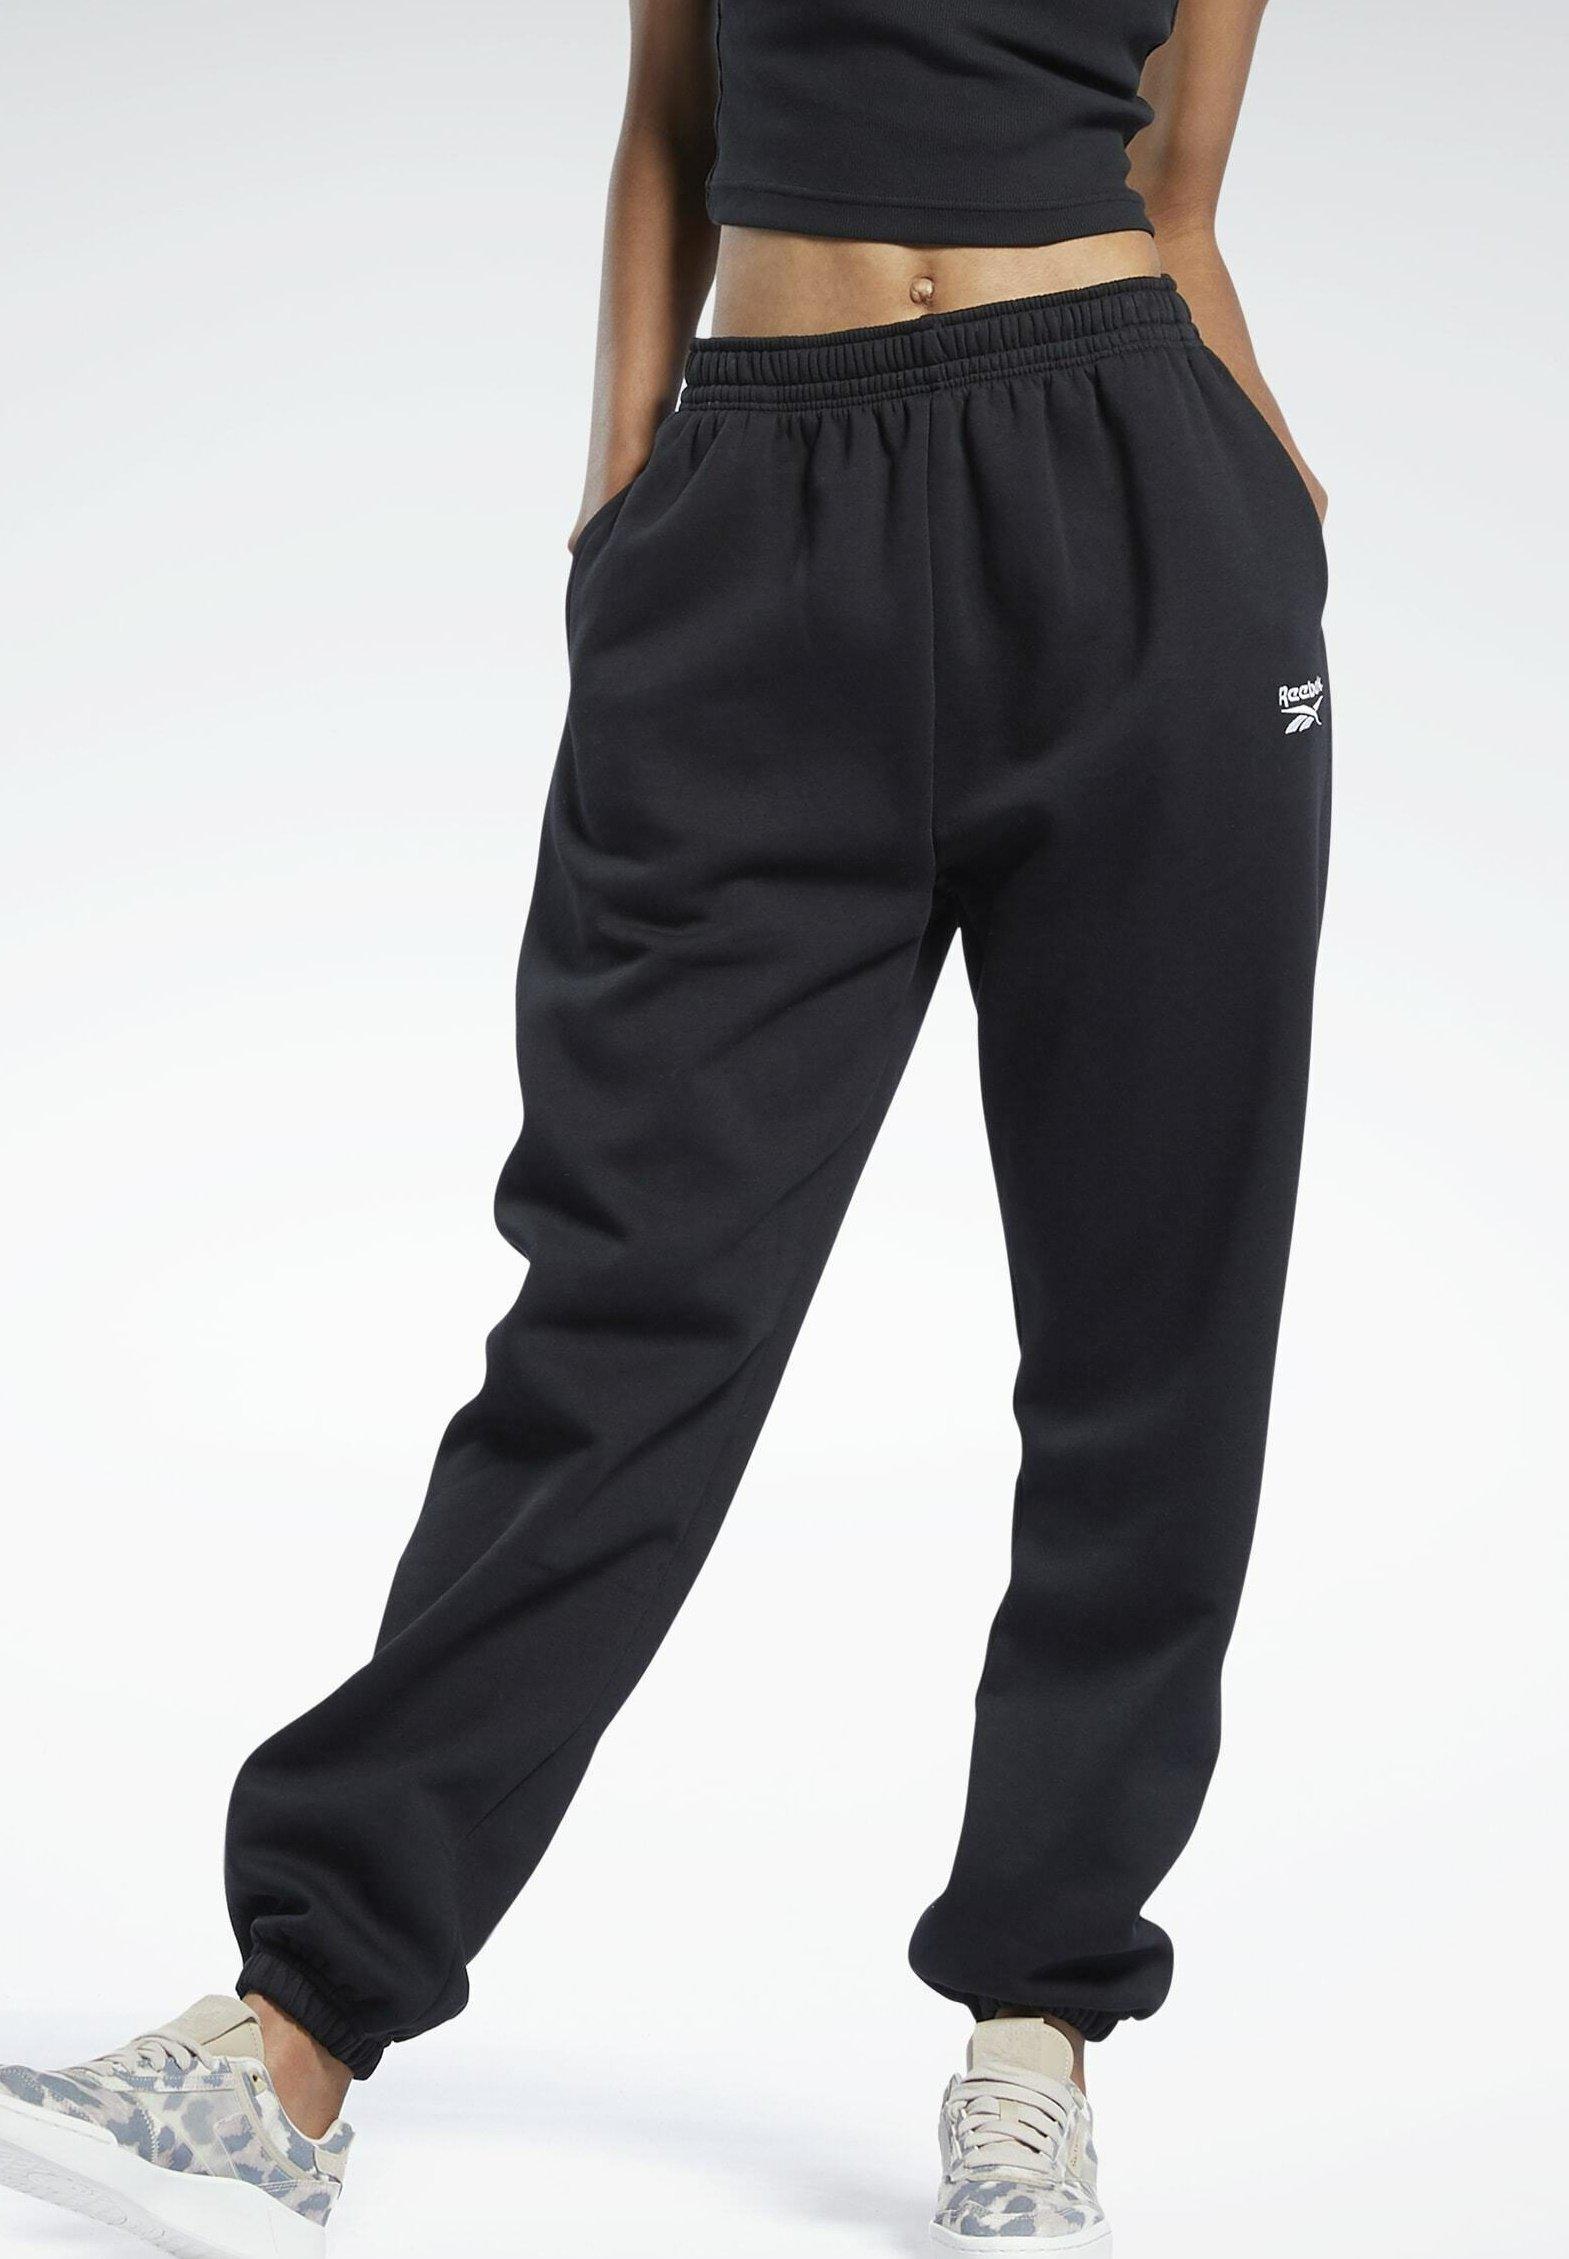 Donna CLASSIC WARDROBE ESSENTIALS COZY FLEECE FOUNDATION - Pantaloni sportivi